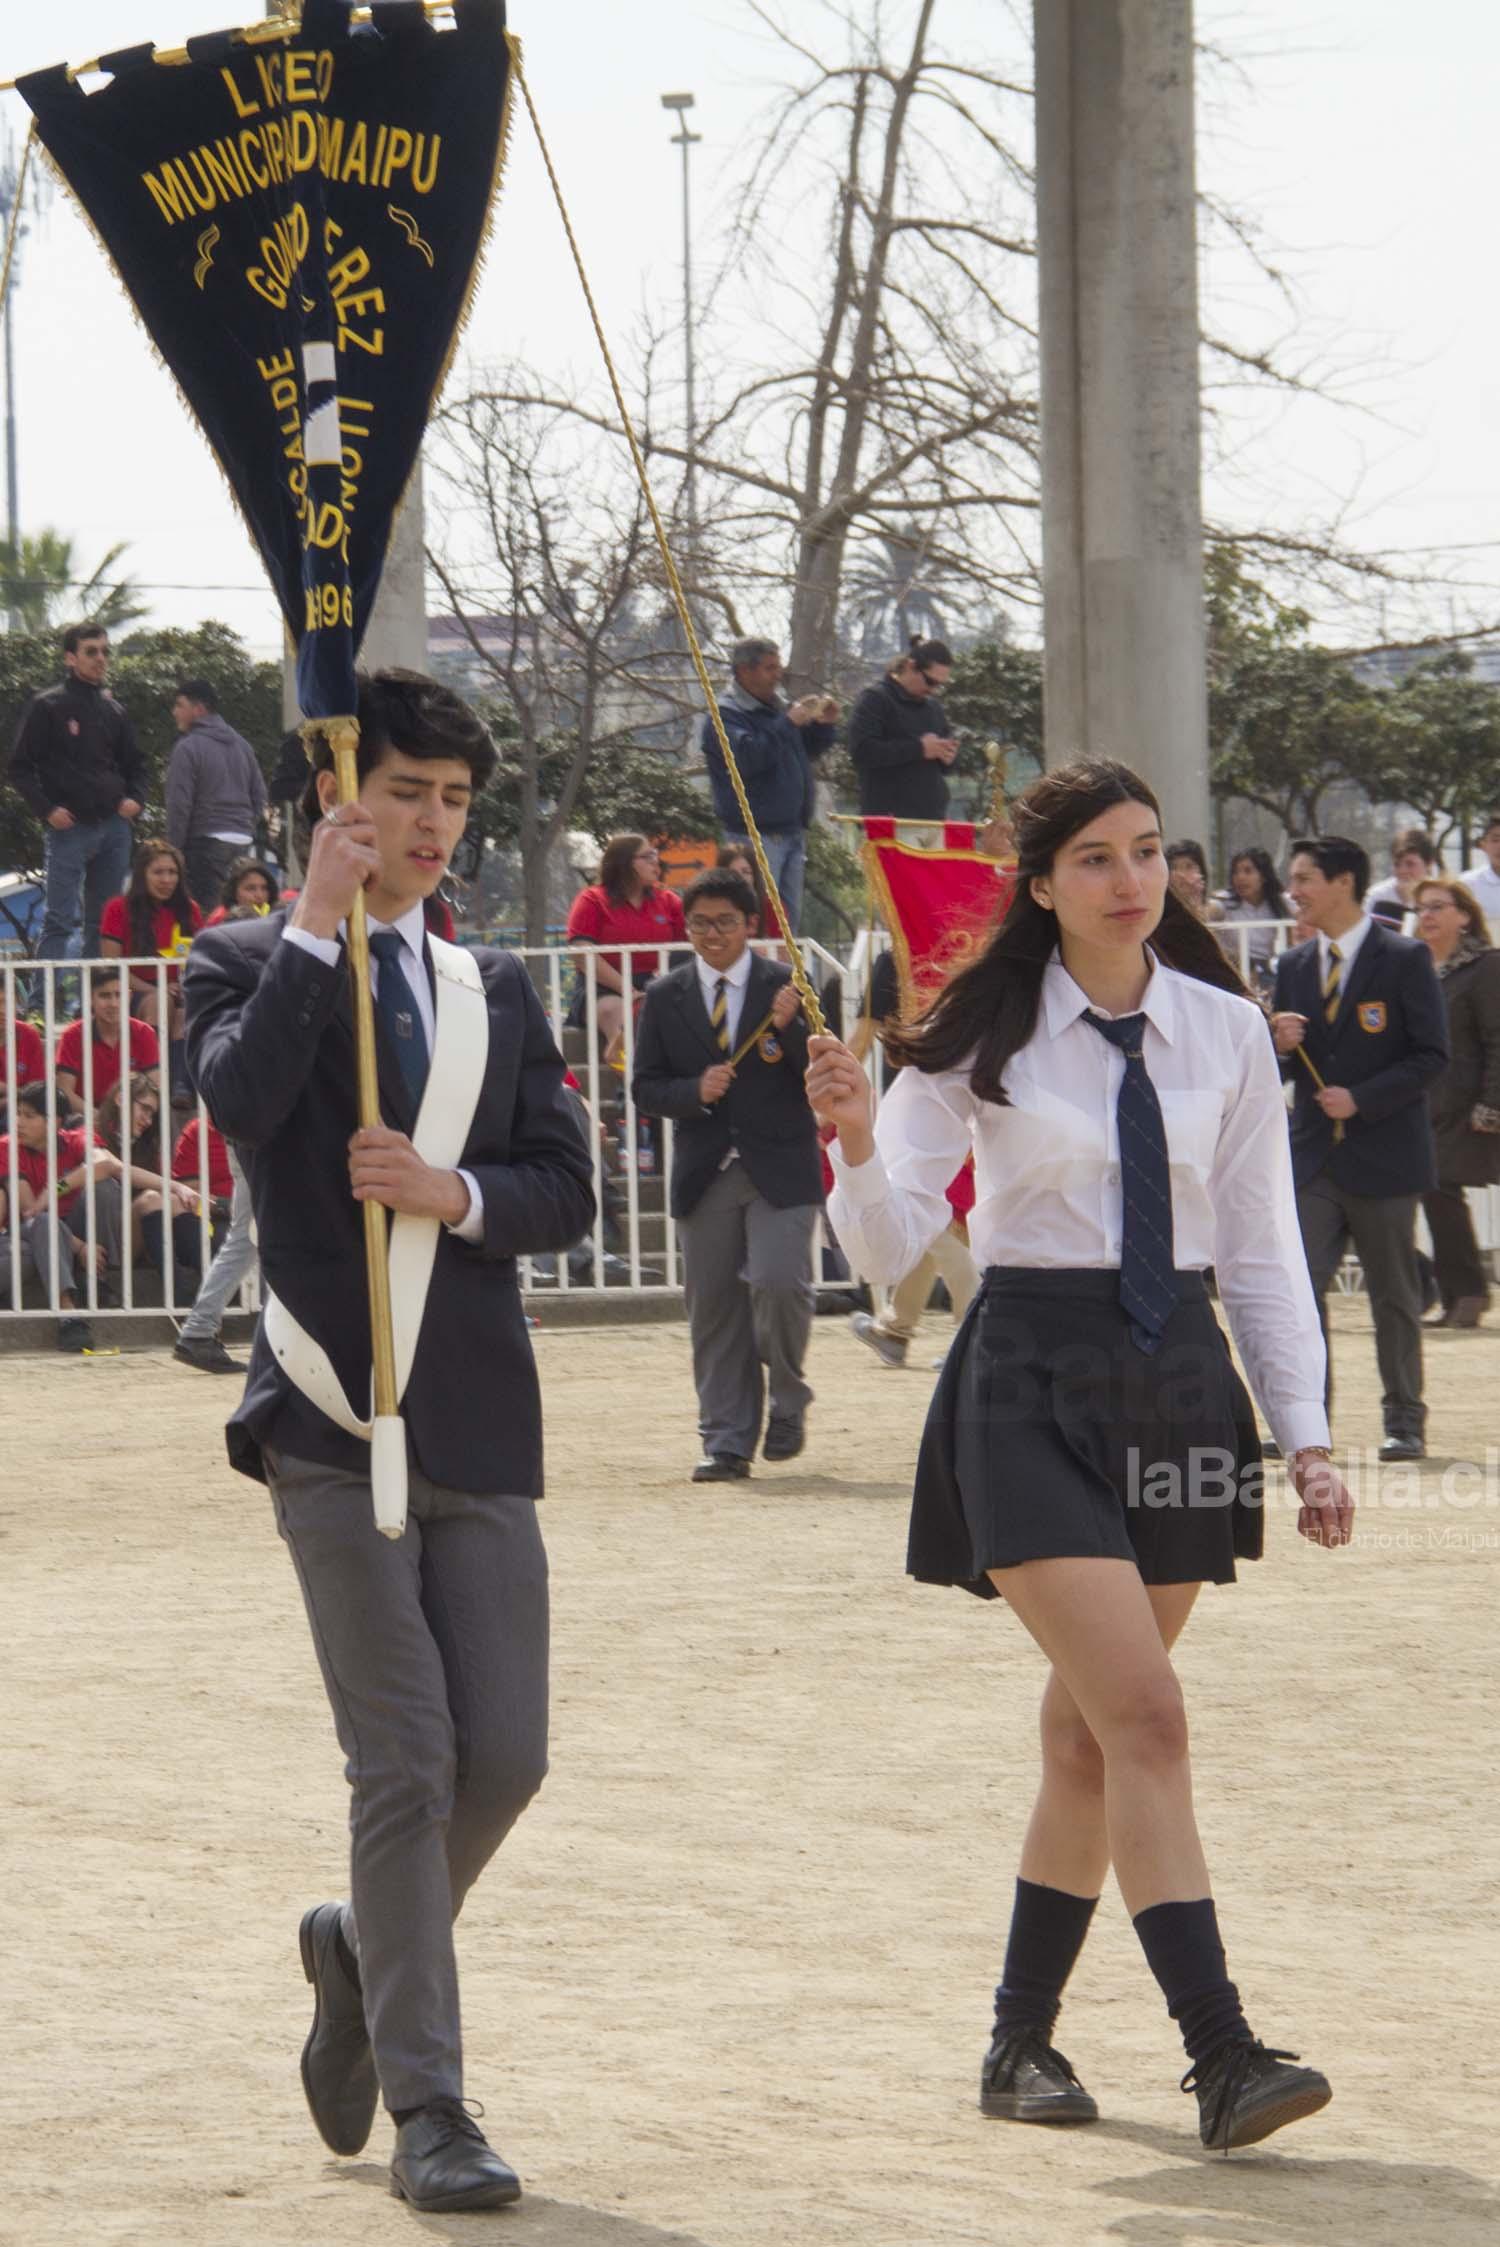 desfile (3)